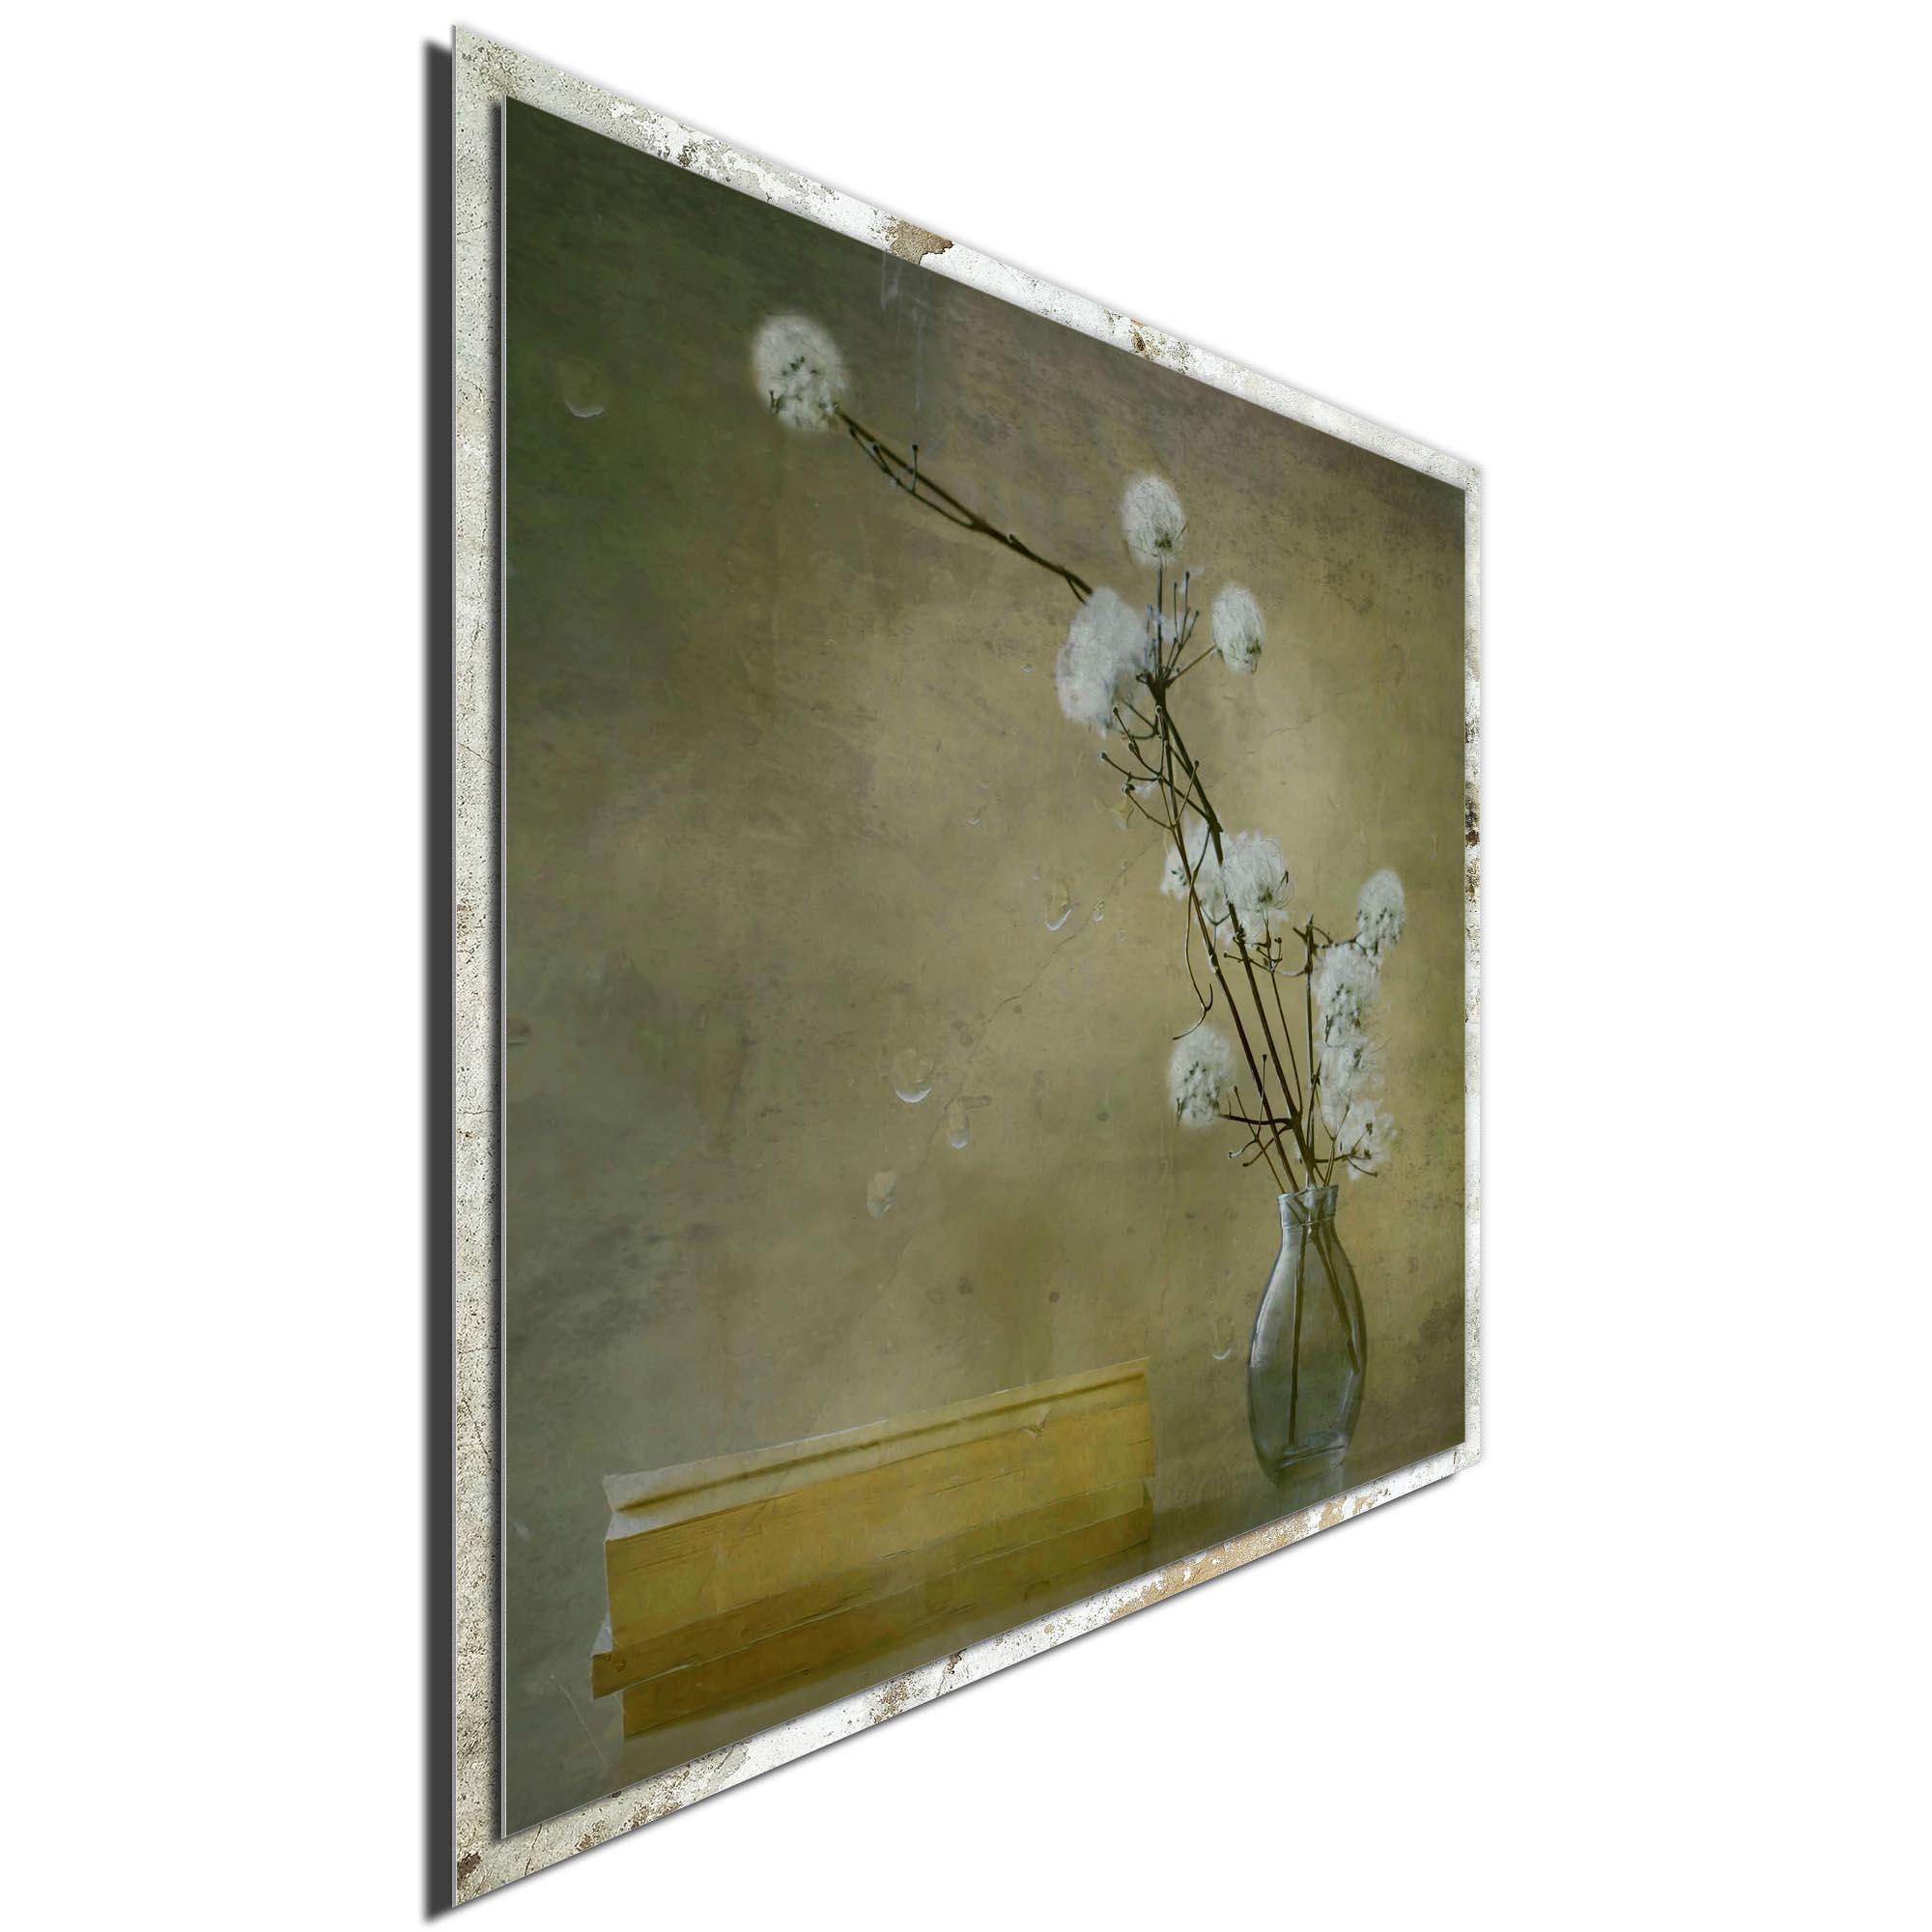 Books by Delphine Devos - Modern Farmhouse Floral on Metal - Image 2